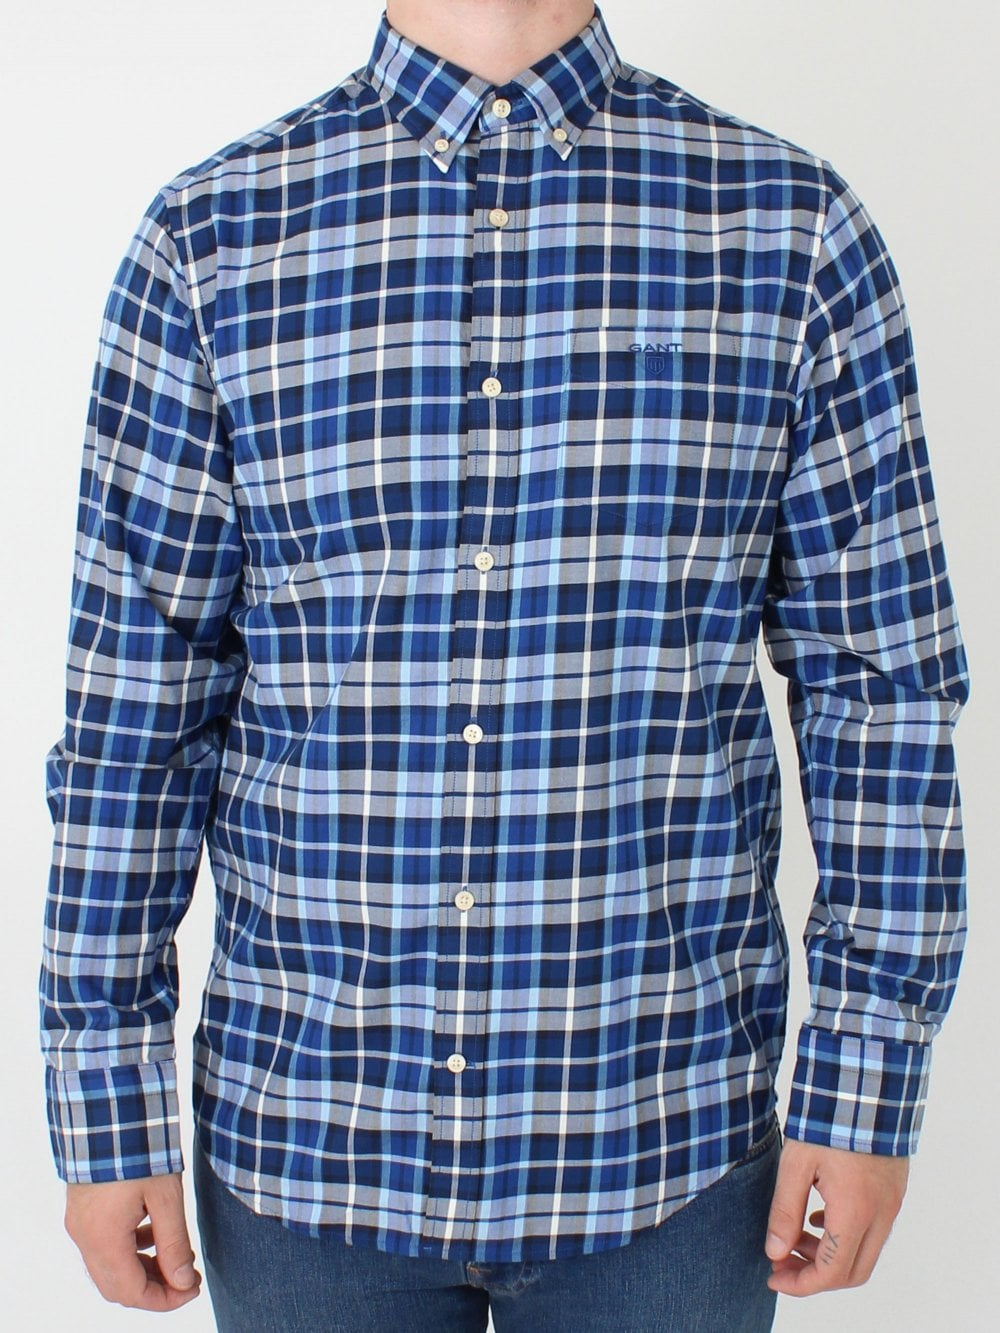 1a5520df44b GANT Winter Twill Plaid Shirt in College Blue | Northern Threads